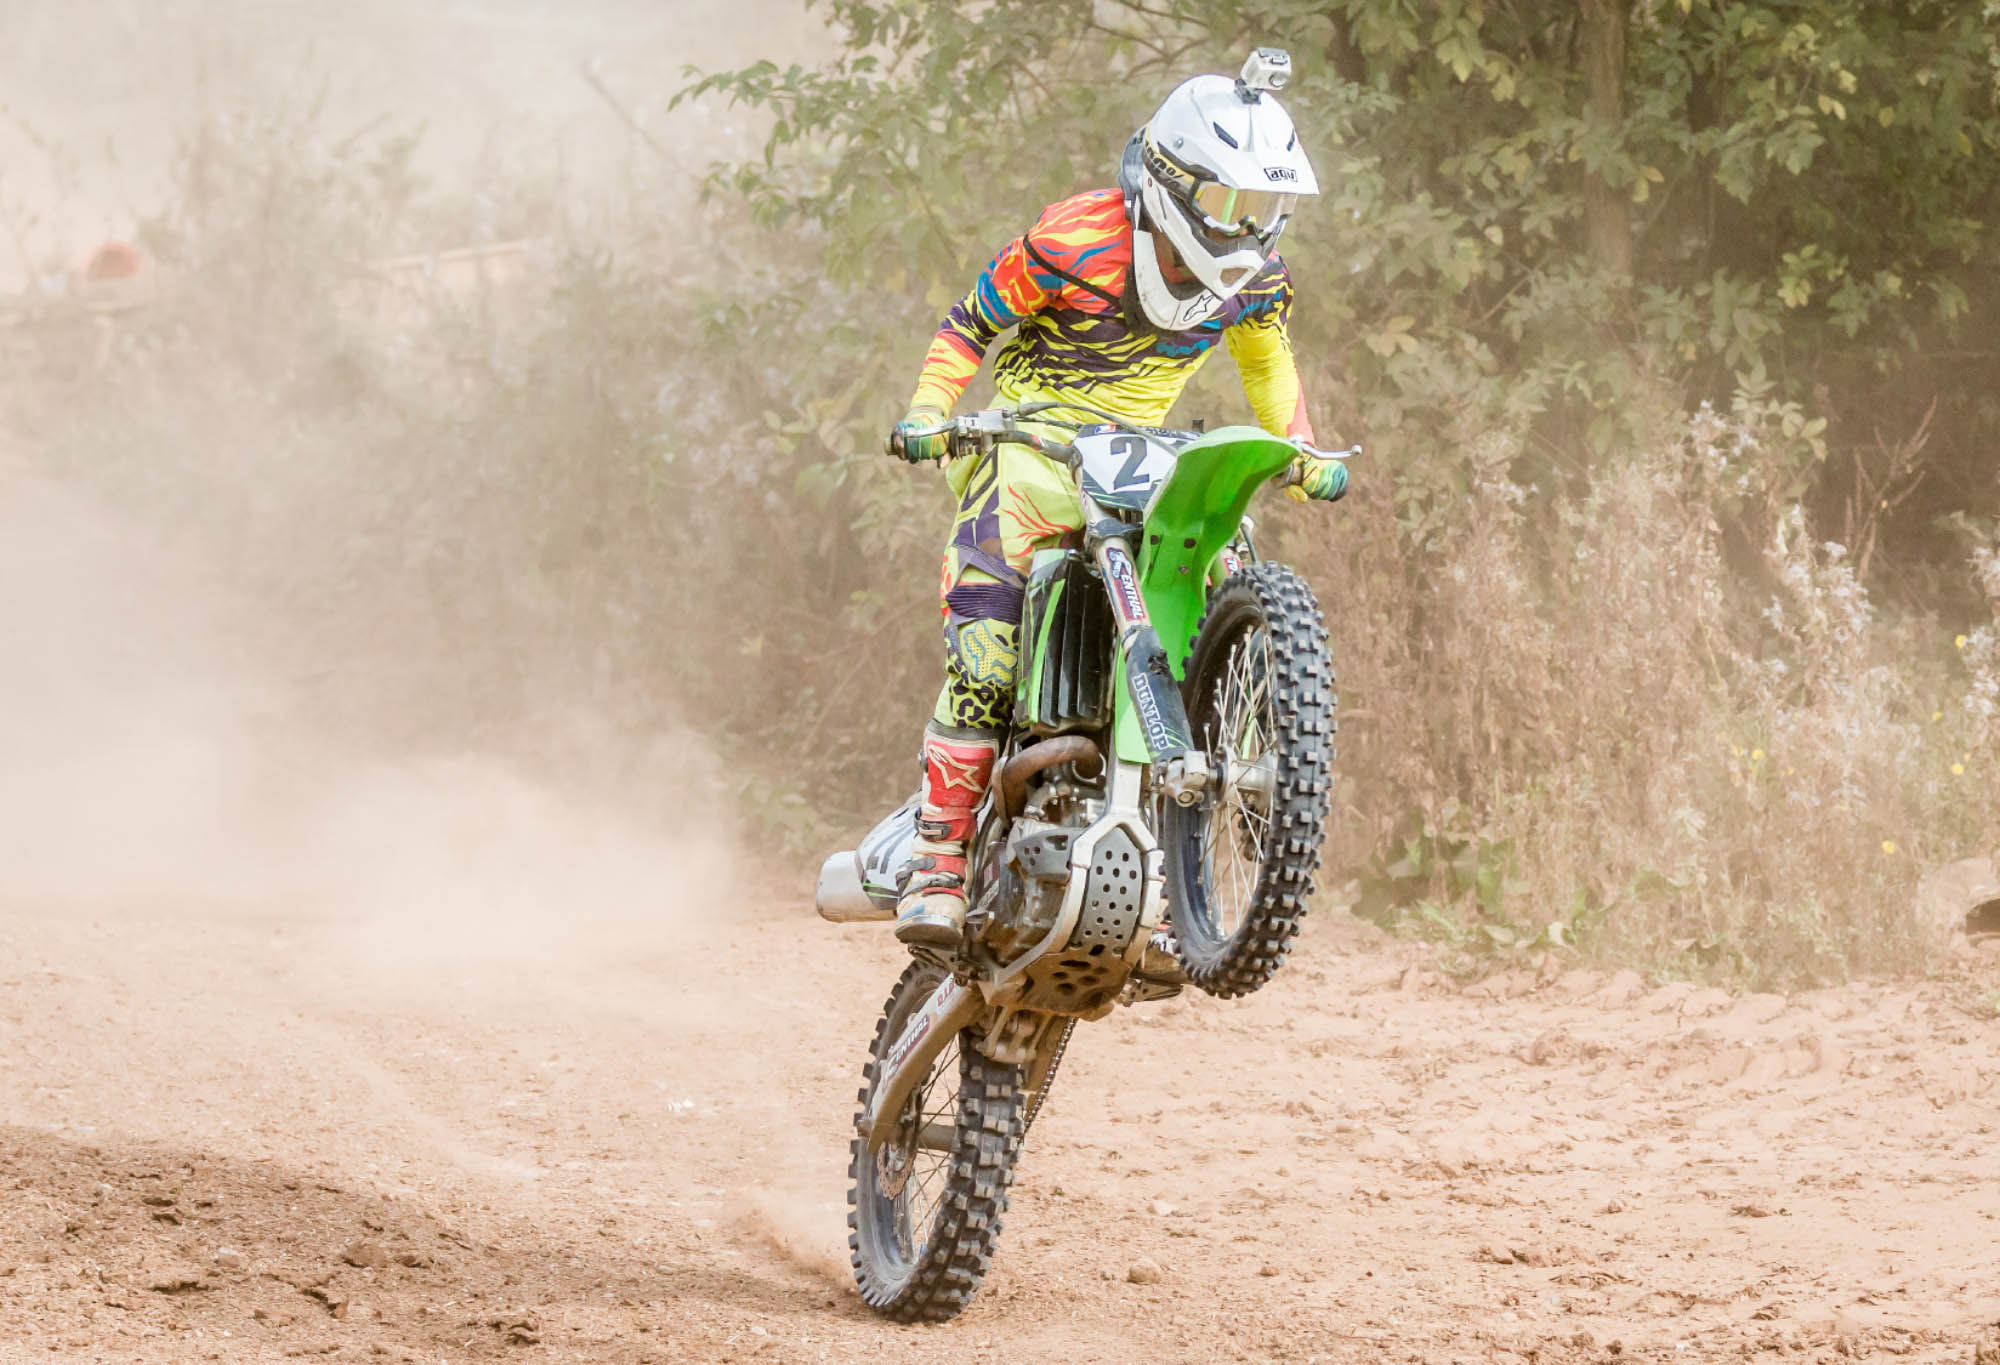 Motocross Photographer Aperture Sports